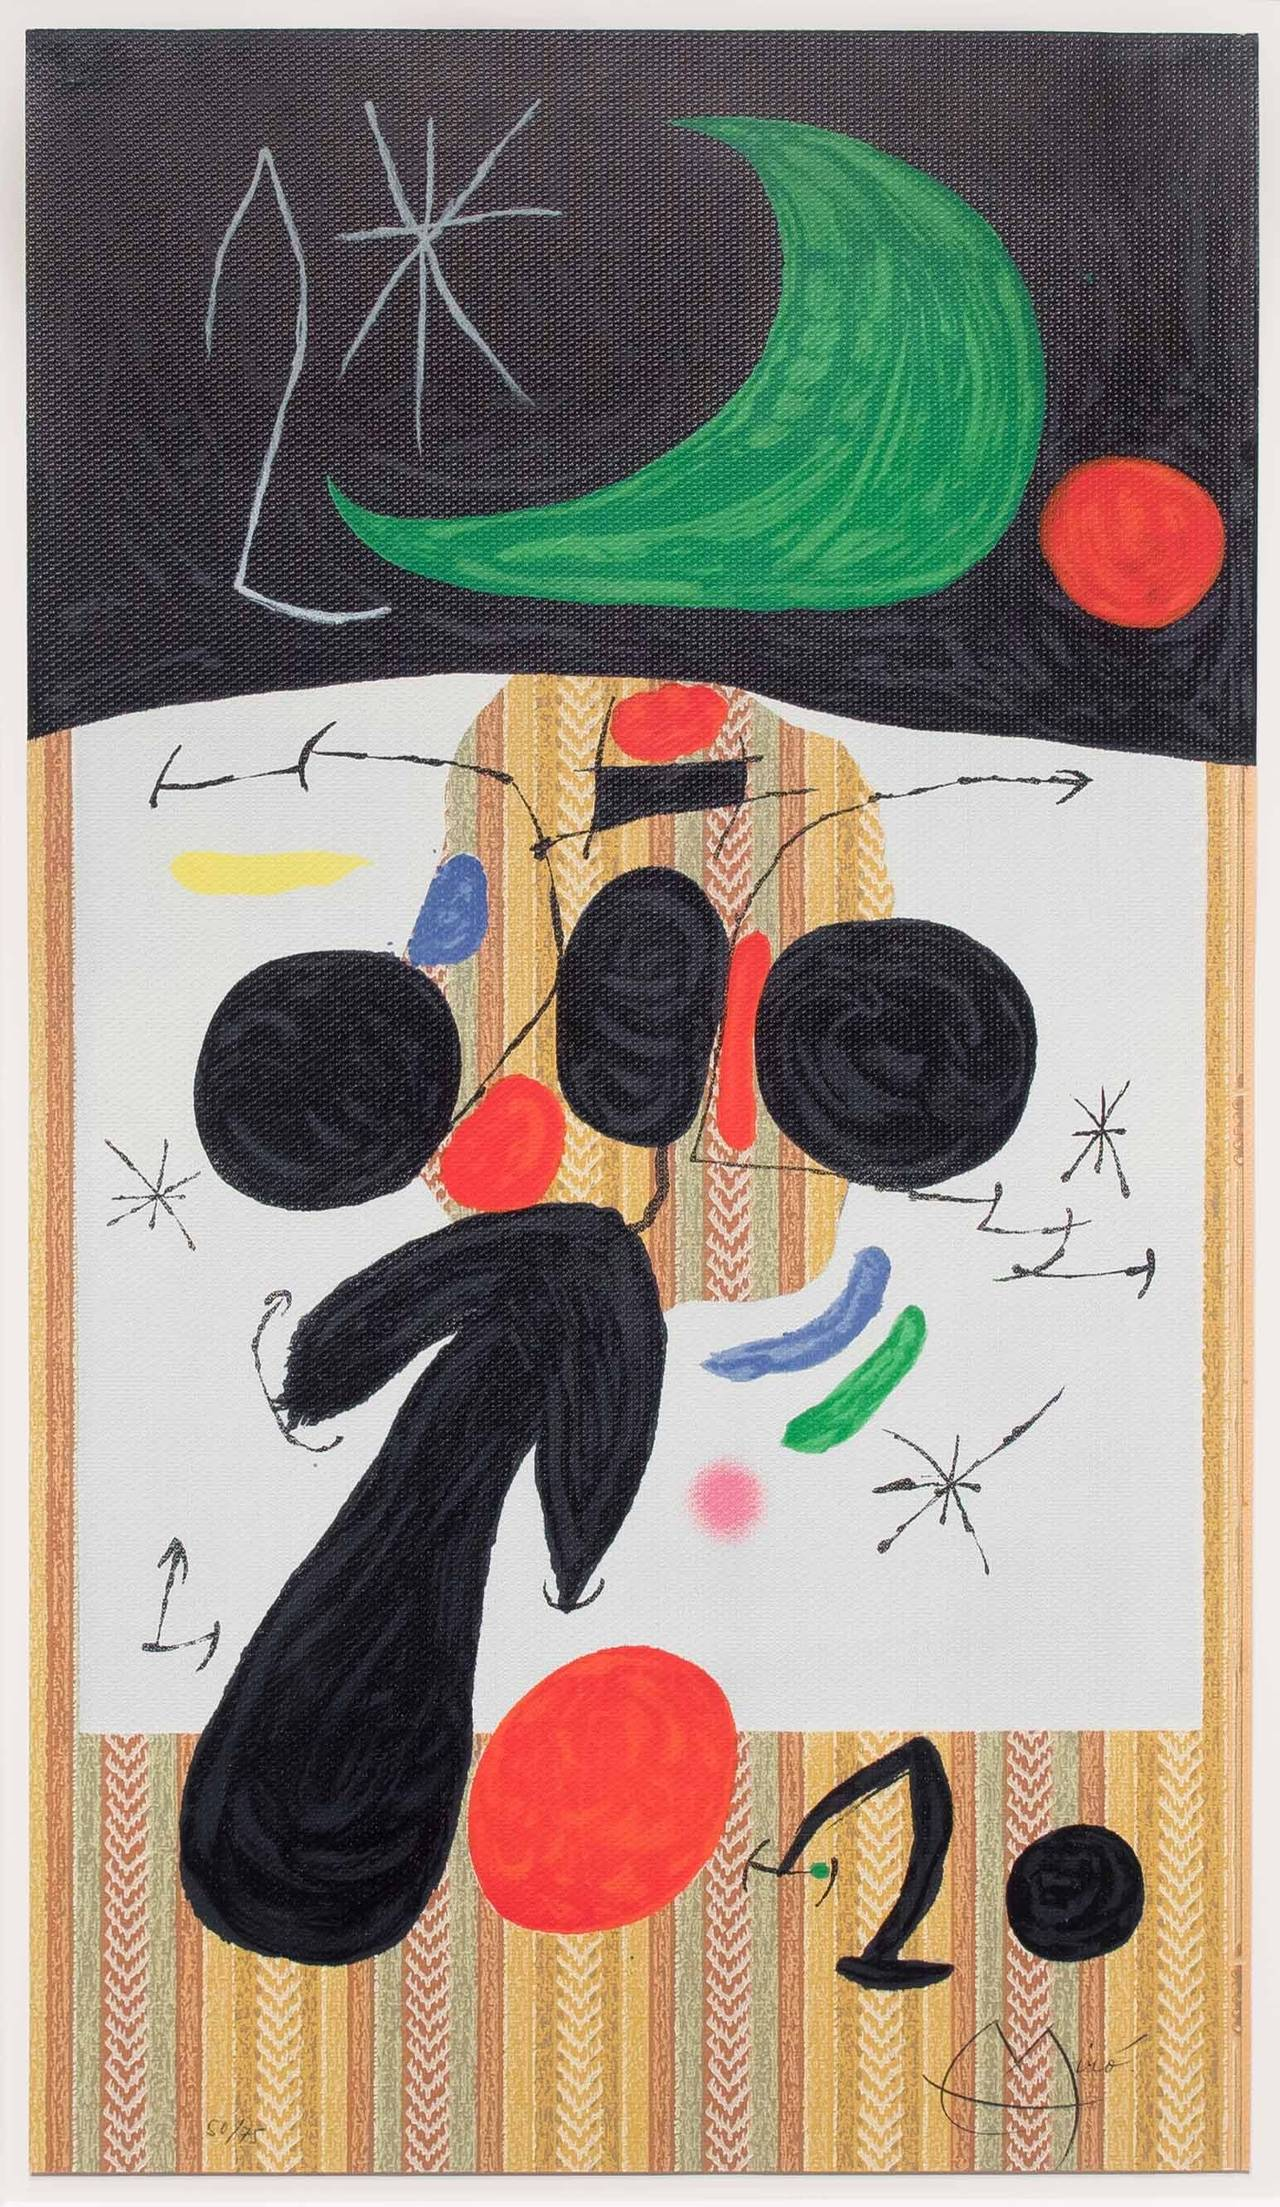 Joan mir interieur et nuit print at 1stdibs for Joan miro interieur hollandais